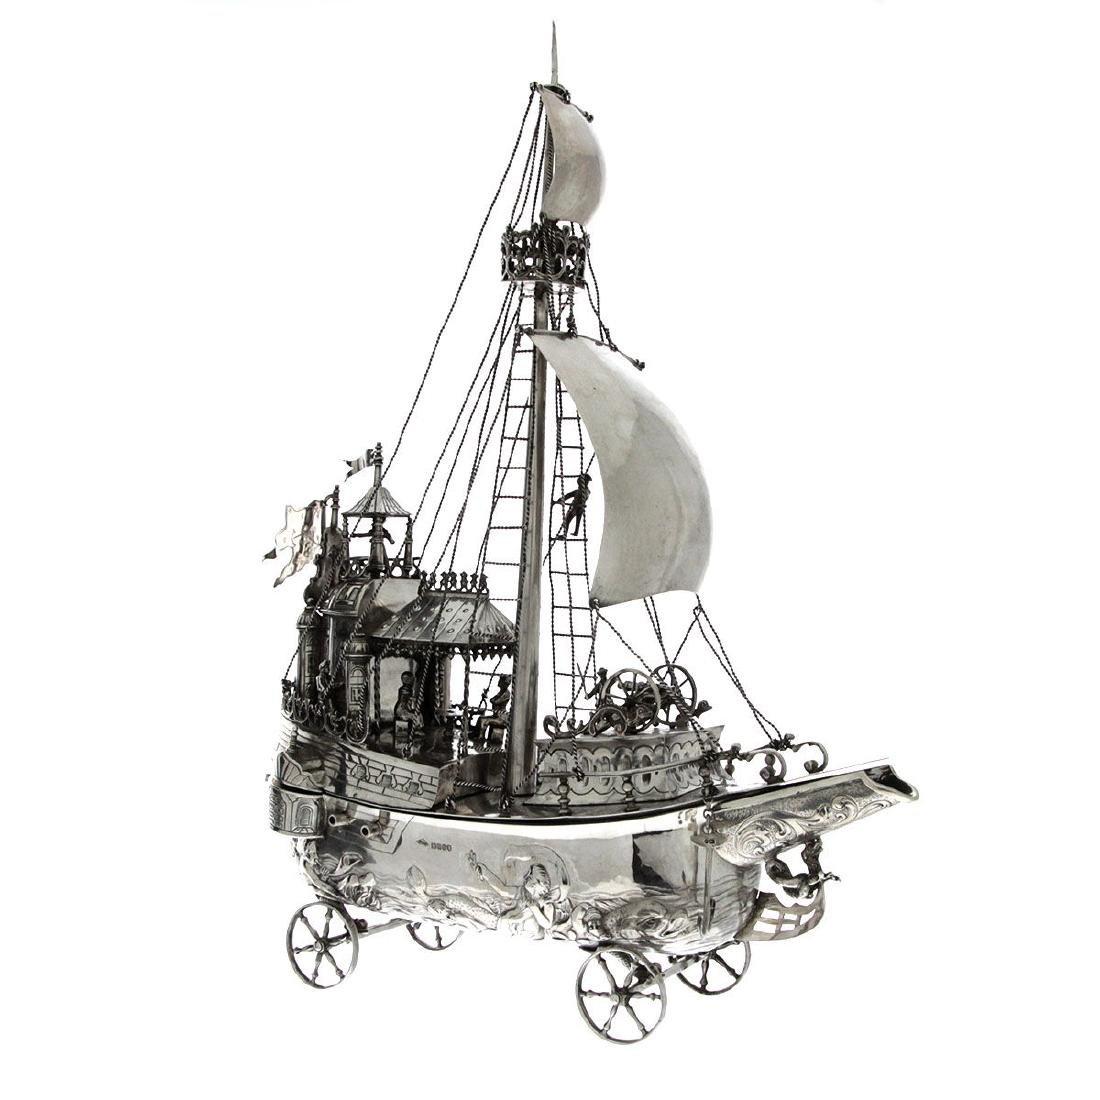 Rare Silver Model of a Galleon Nef, Karl Kurz,